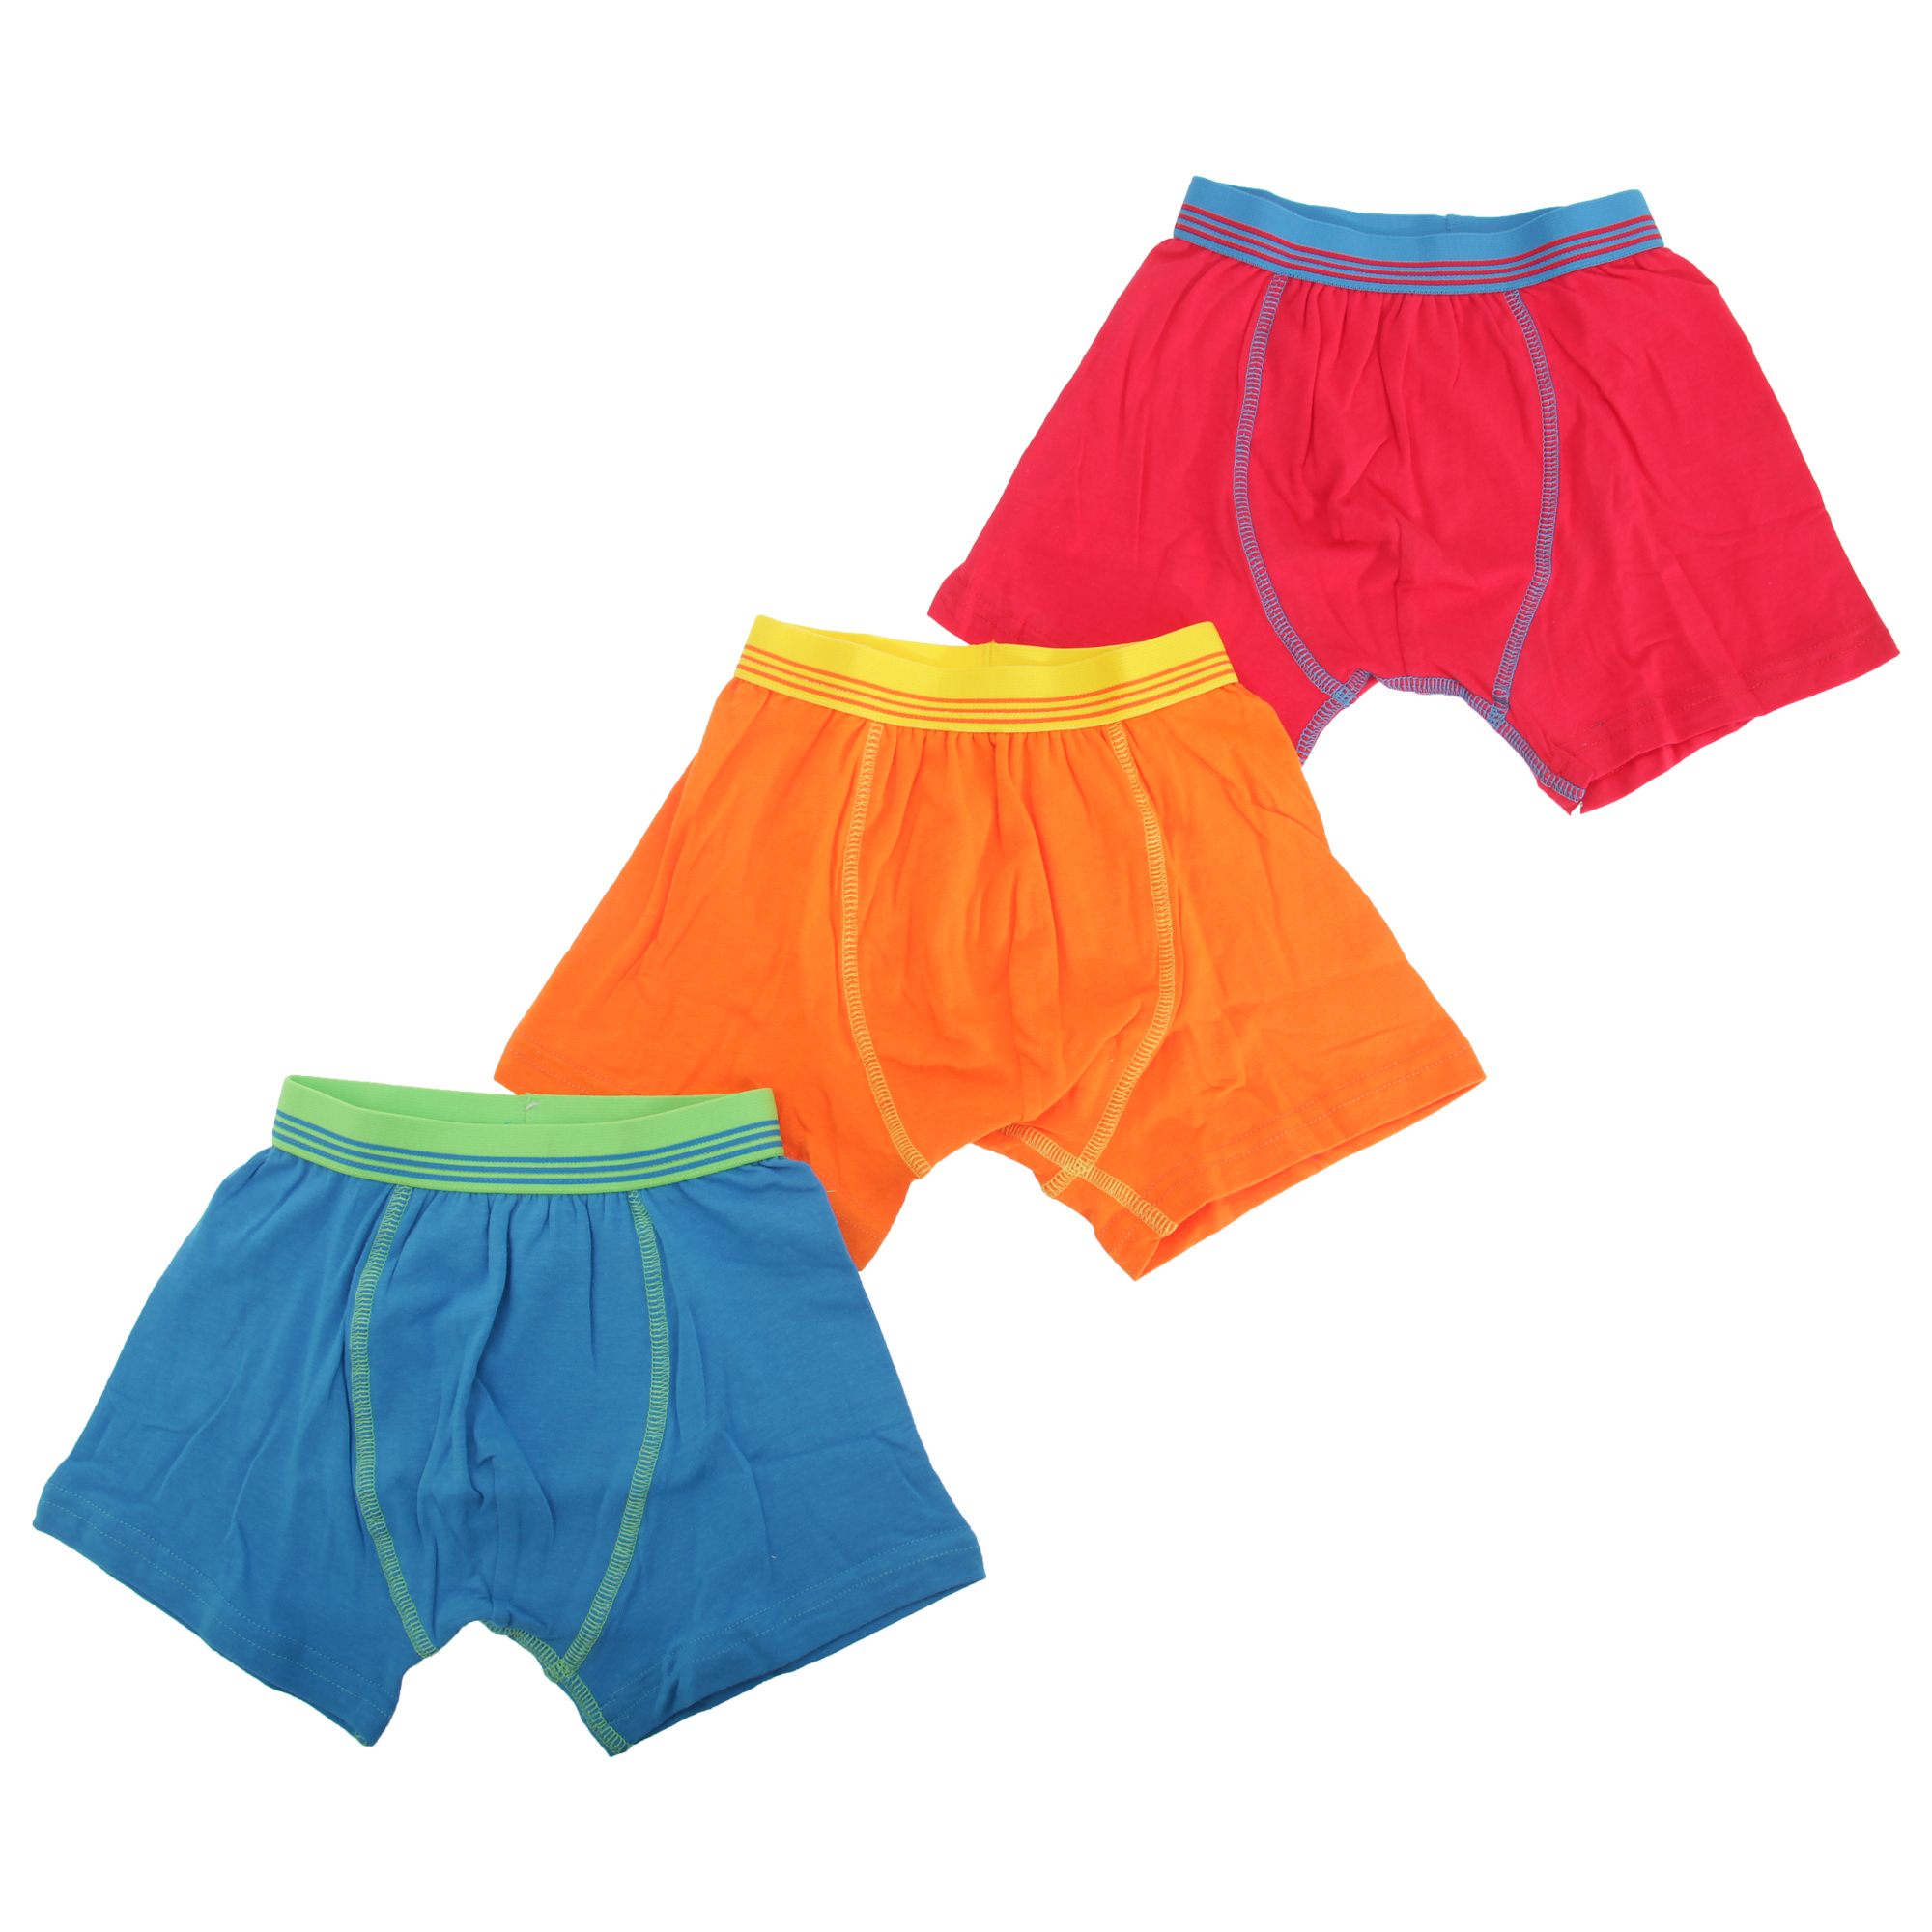 KU191 Pack Childrens Boys Contrast Band Design Trunks//Boxer Shorts Underwear